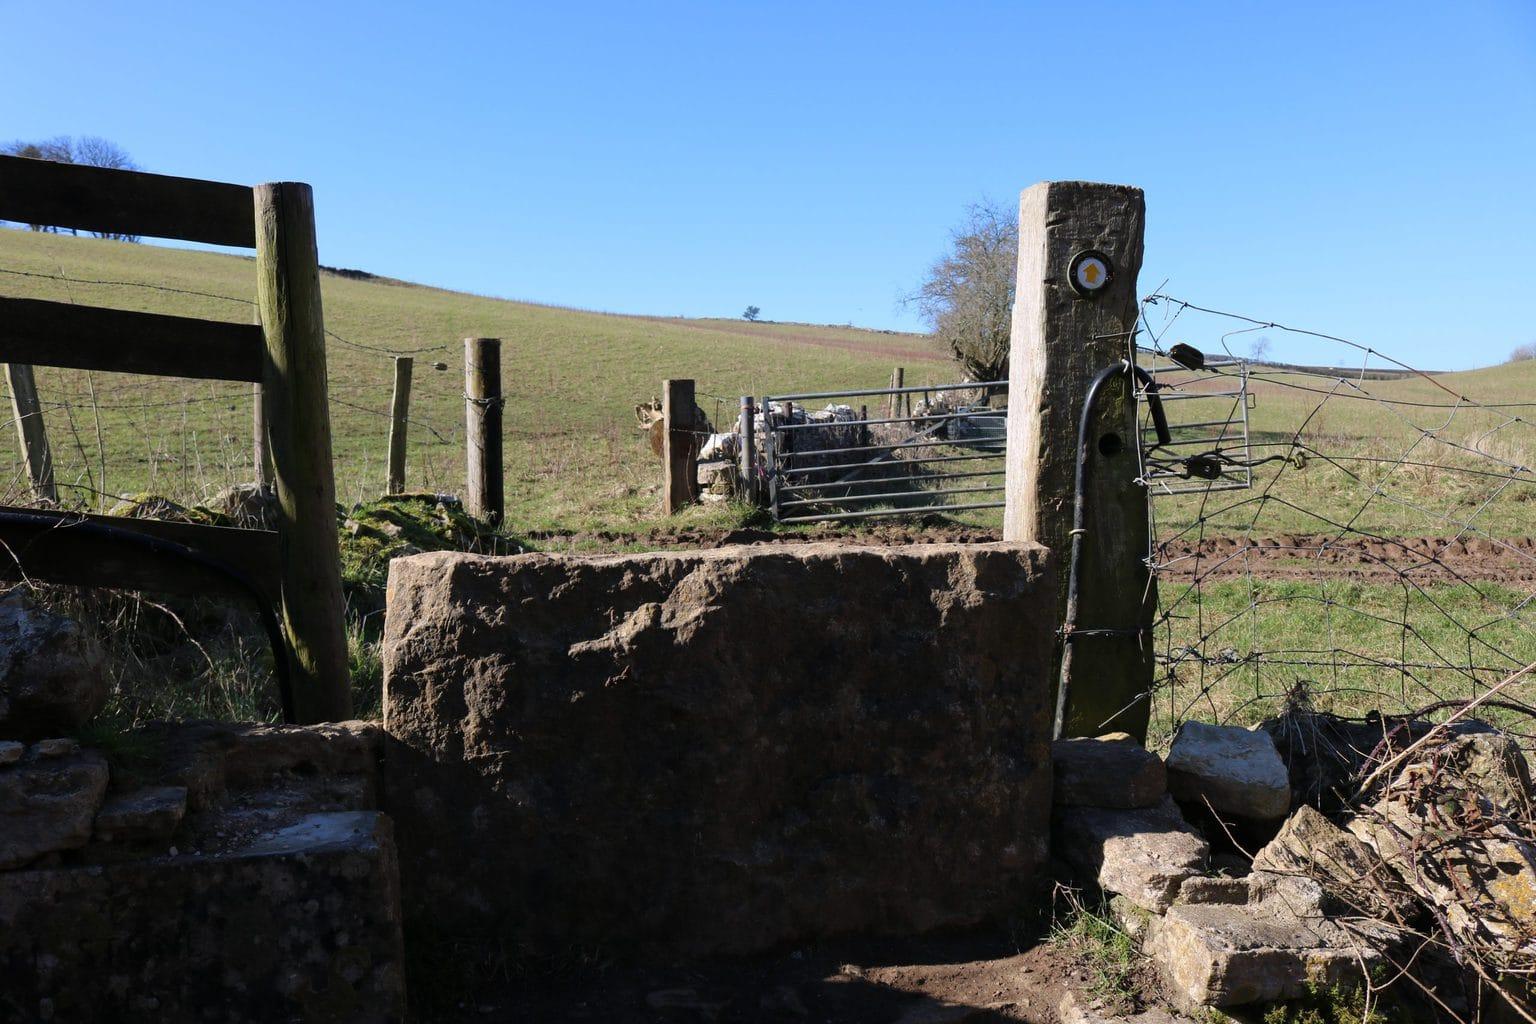 South Dorset Ridgeway Waymarker on a stone stile